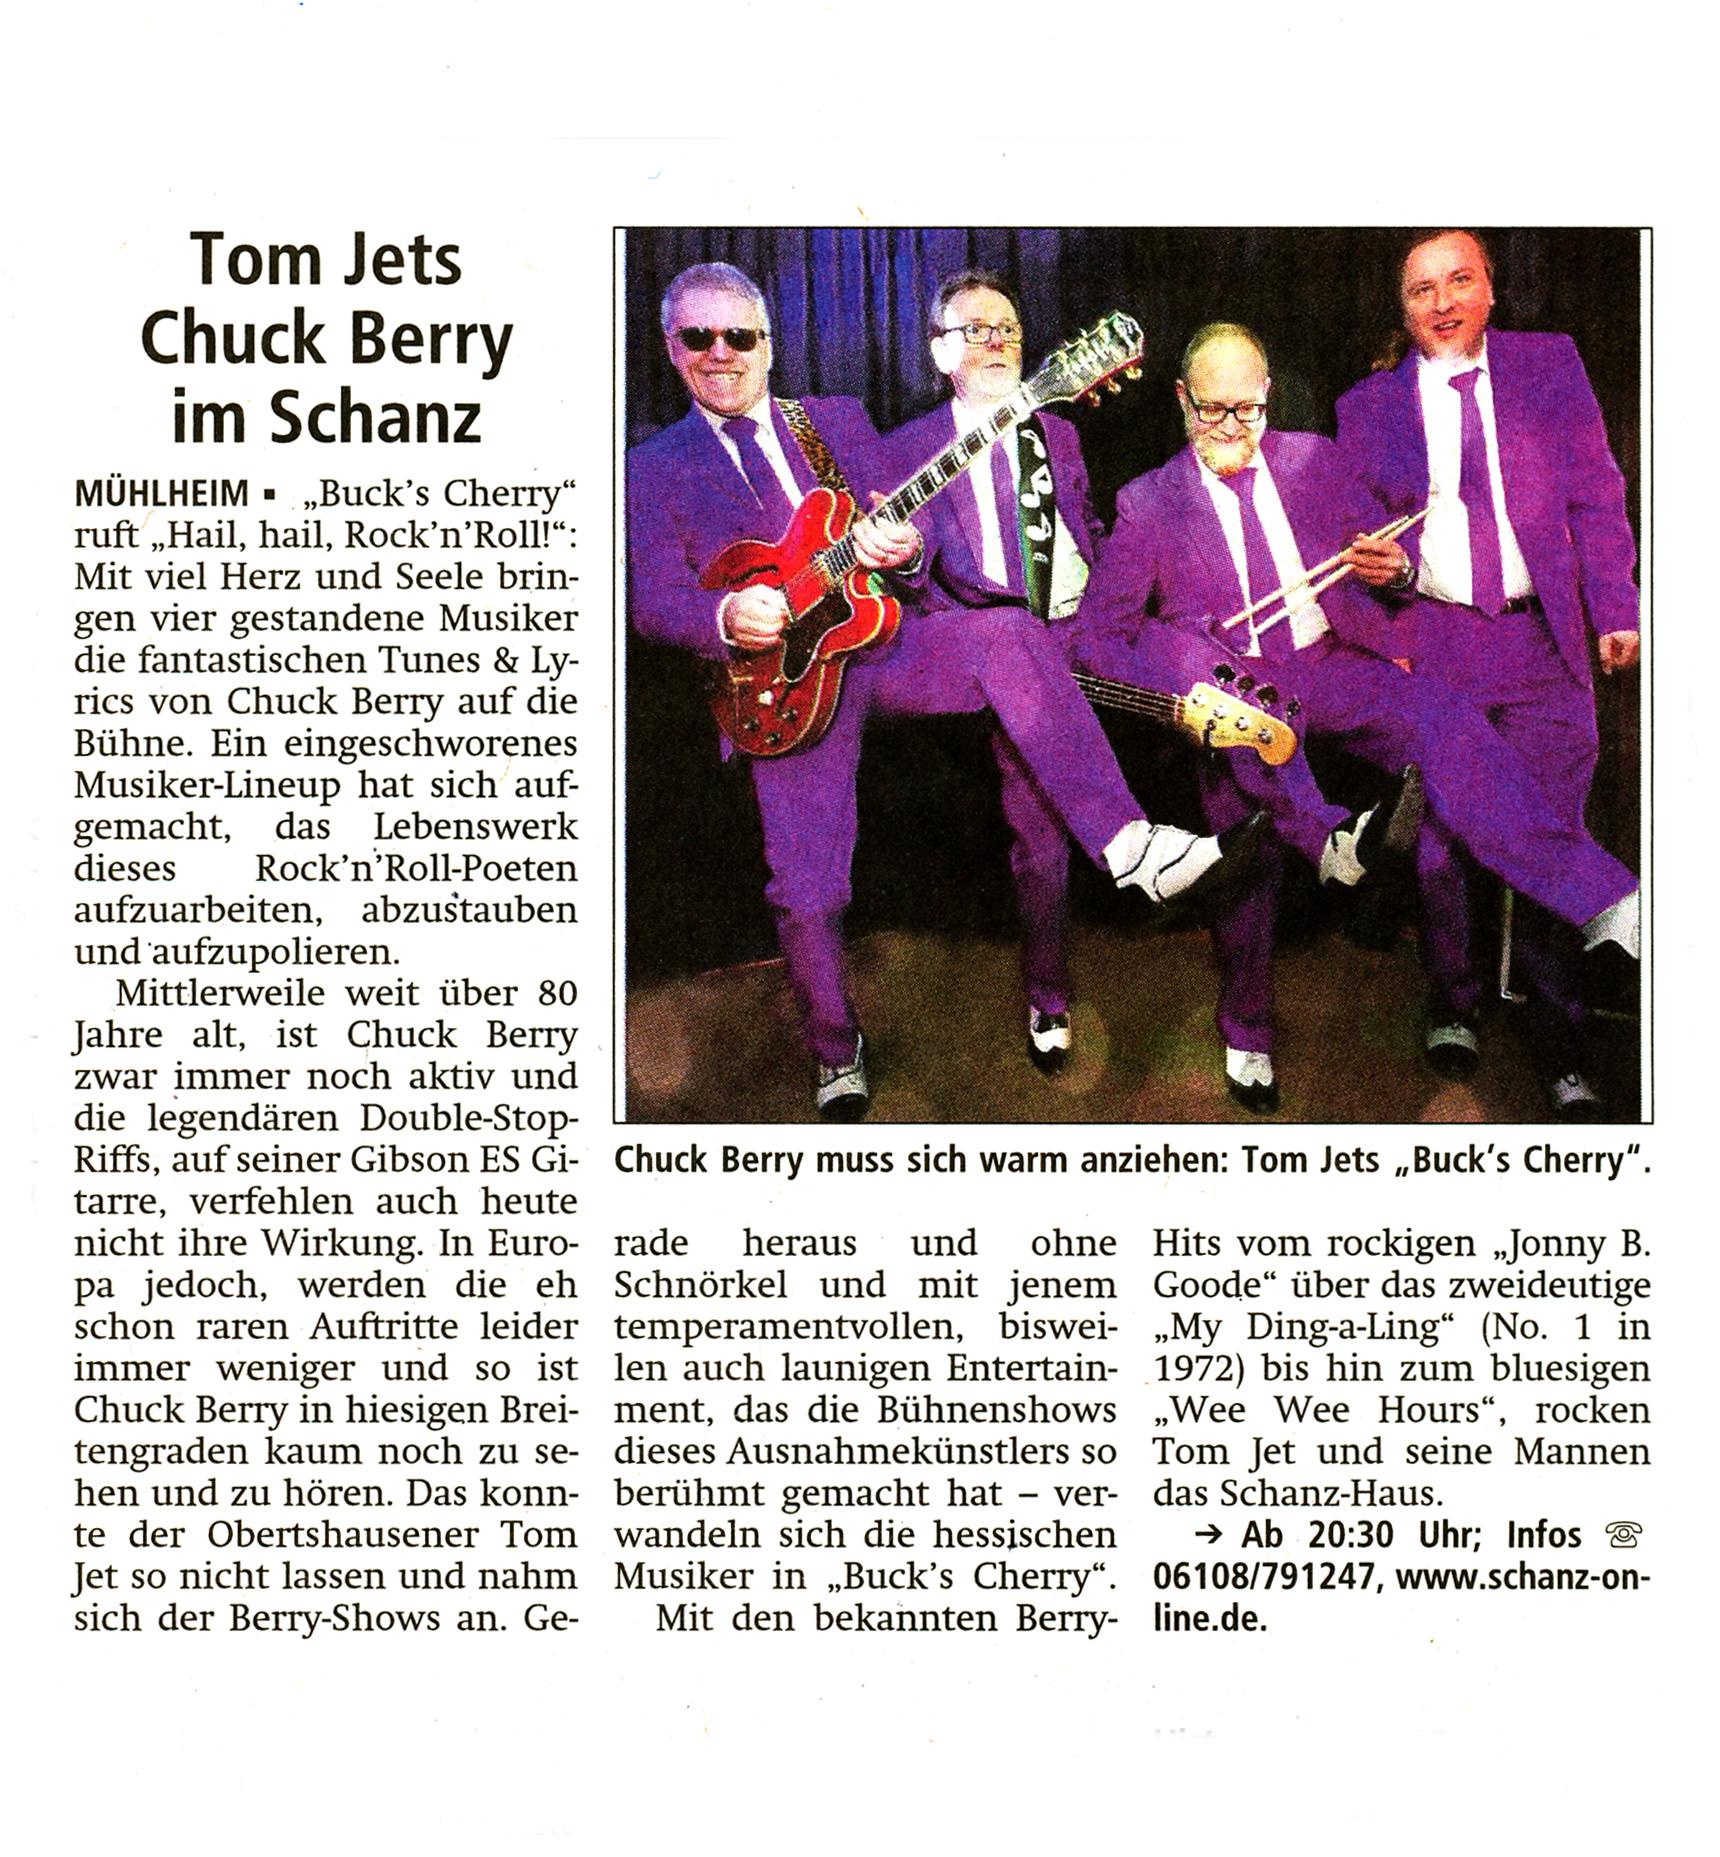 Offenbach Post, 5. Mai 2016